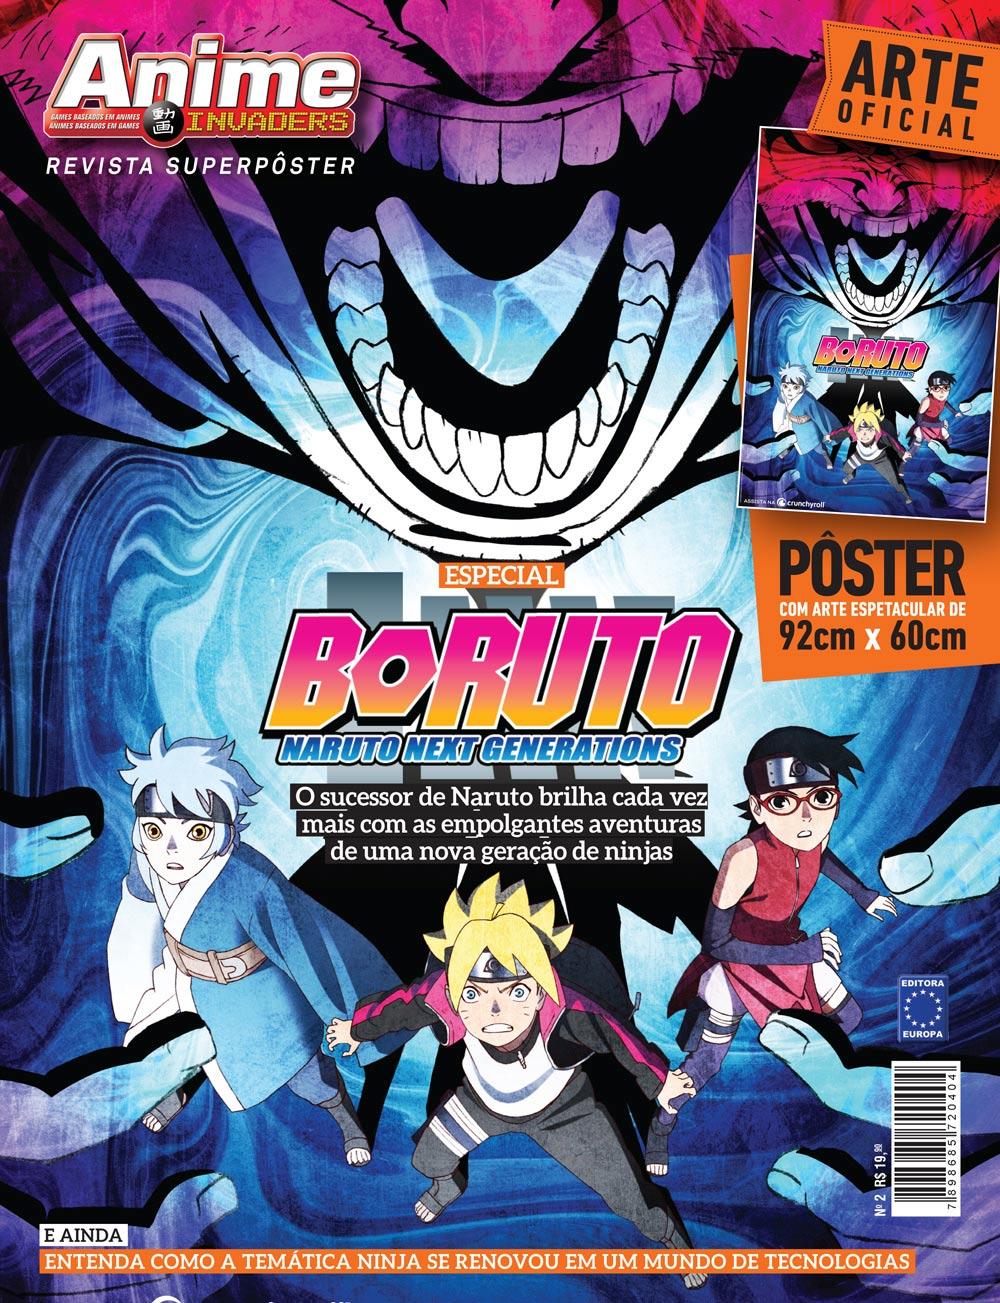 Revista Superpôster Anime Invaders - Boruto